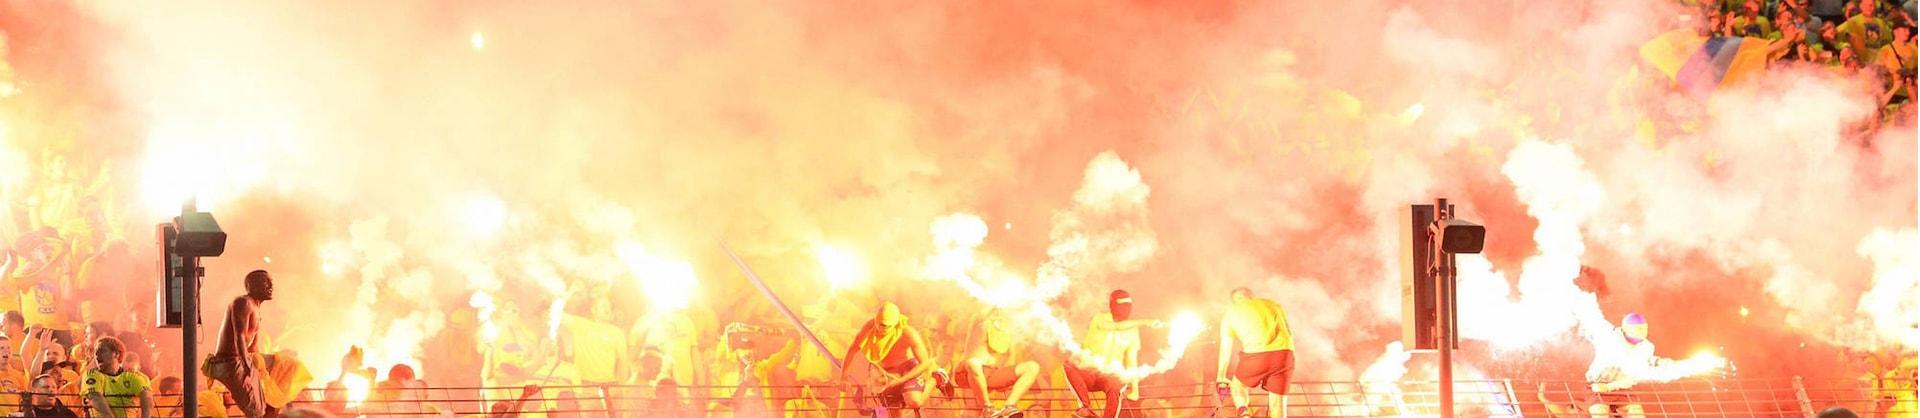 Fanaktionen im Achtelfinale des DFB-Pokals